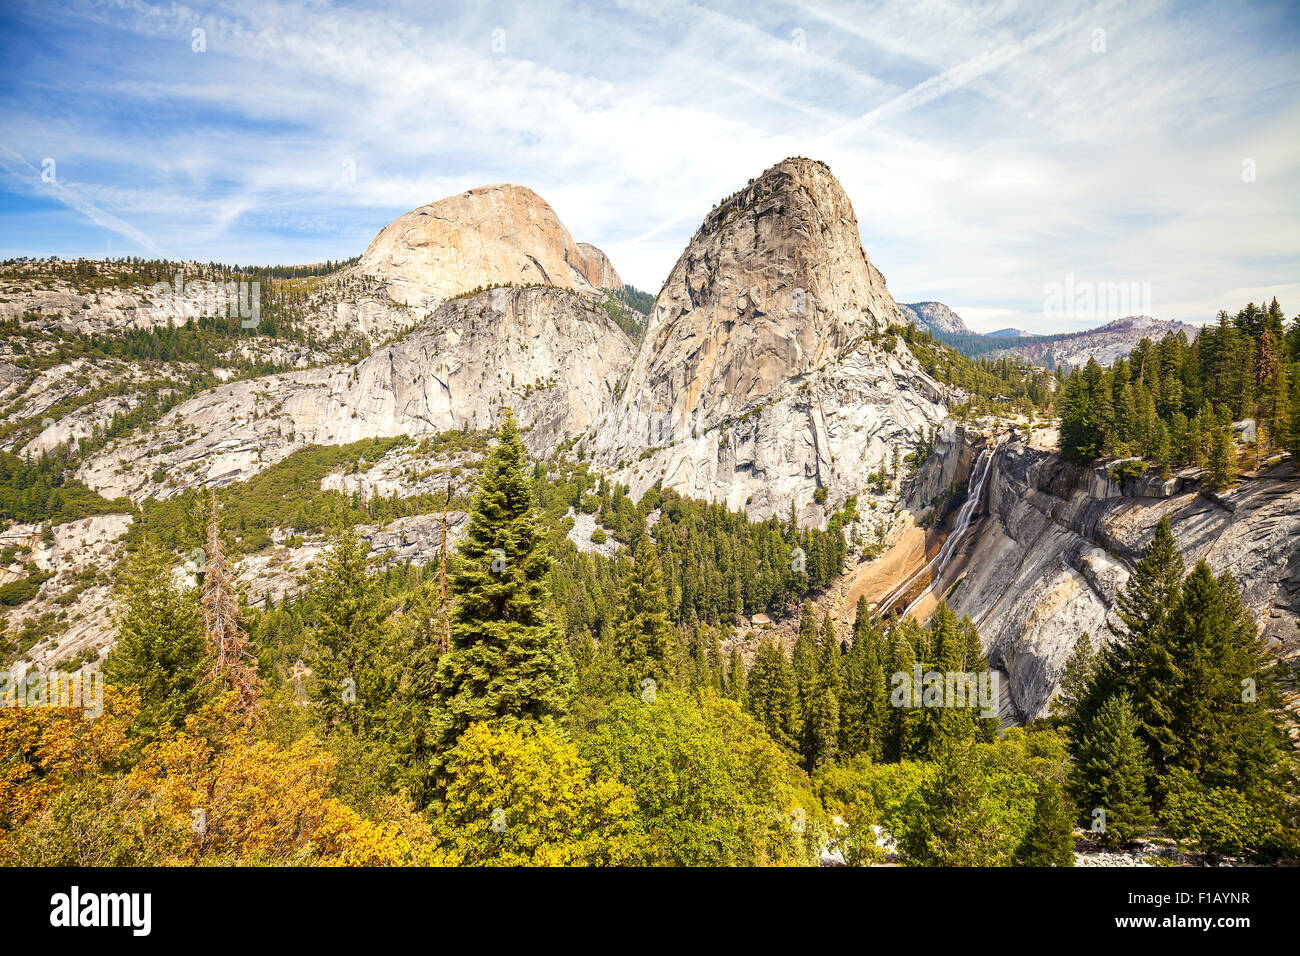 Nevada fall in Yosemite National Park, California, USA. - Stock Image